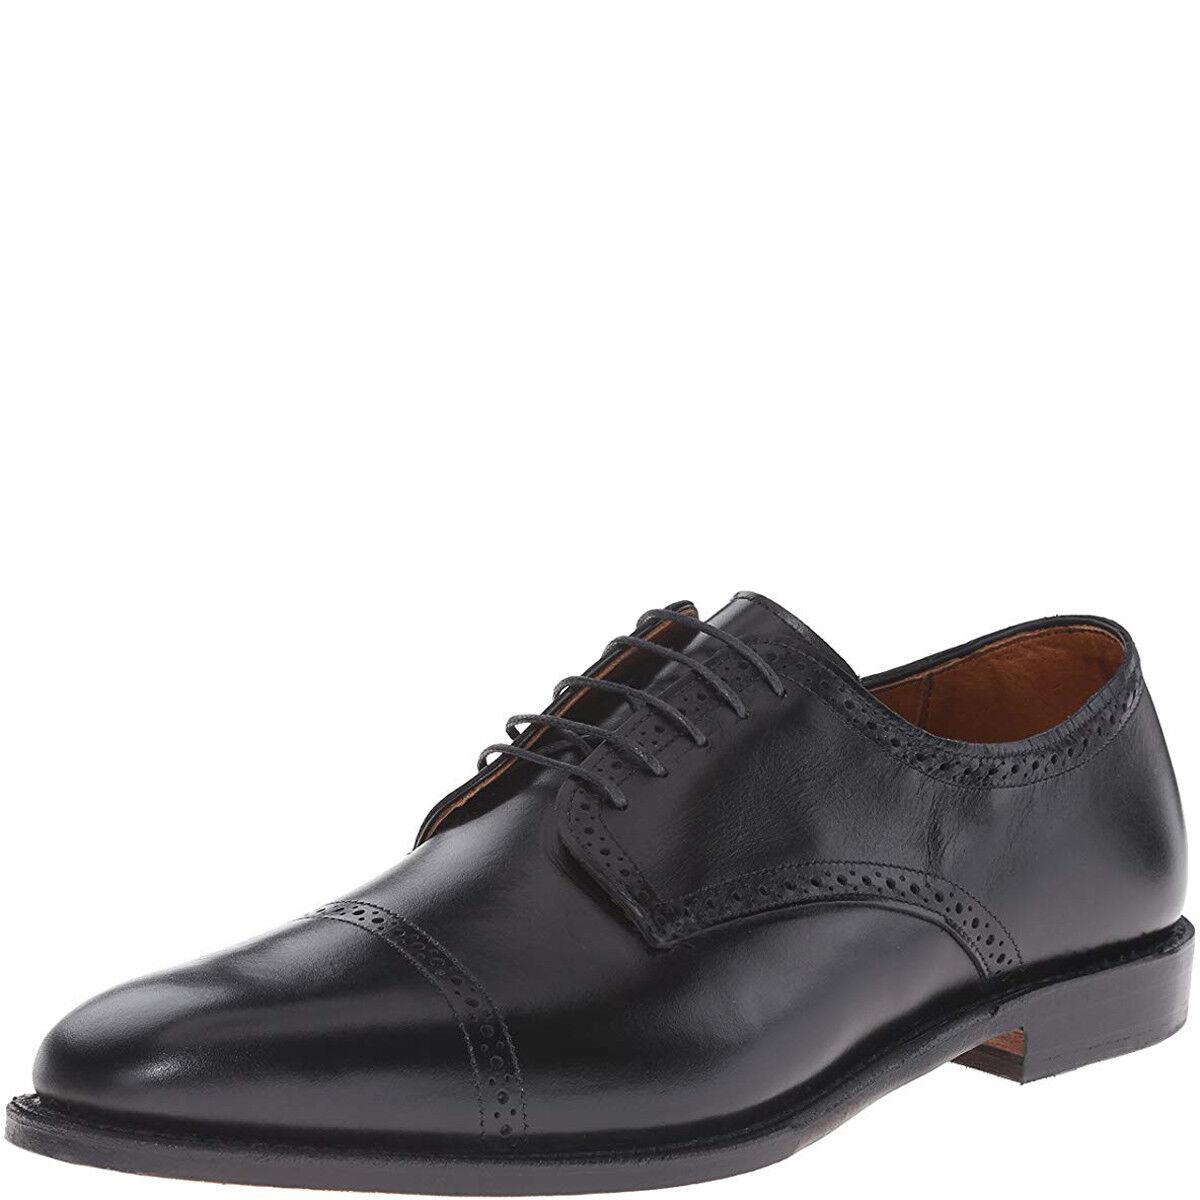 Allen Edmonds Mens Yorktown Oxford scarpe nero 8.5 D MSRP 395 New